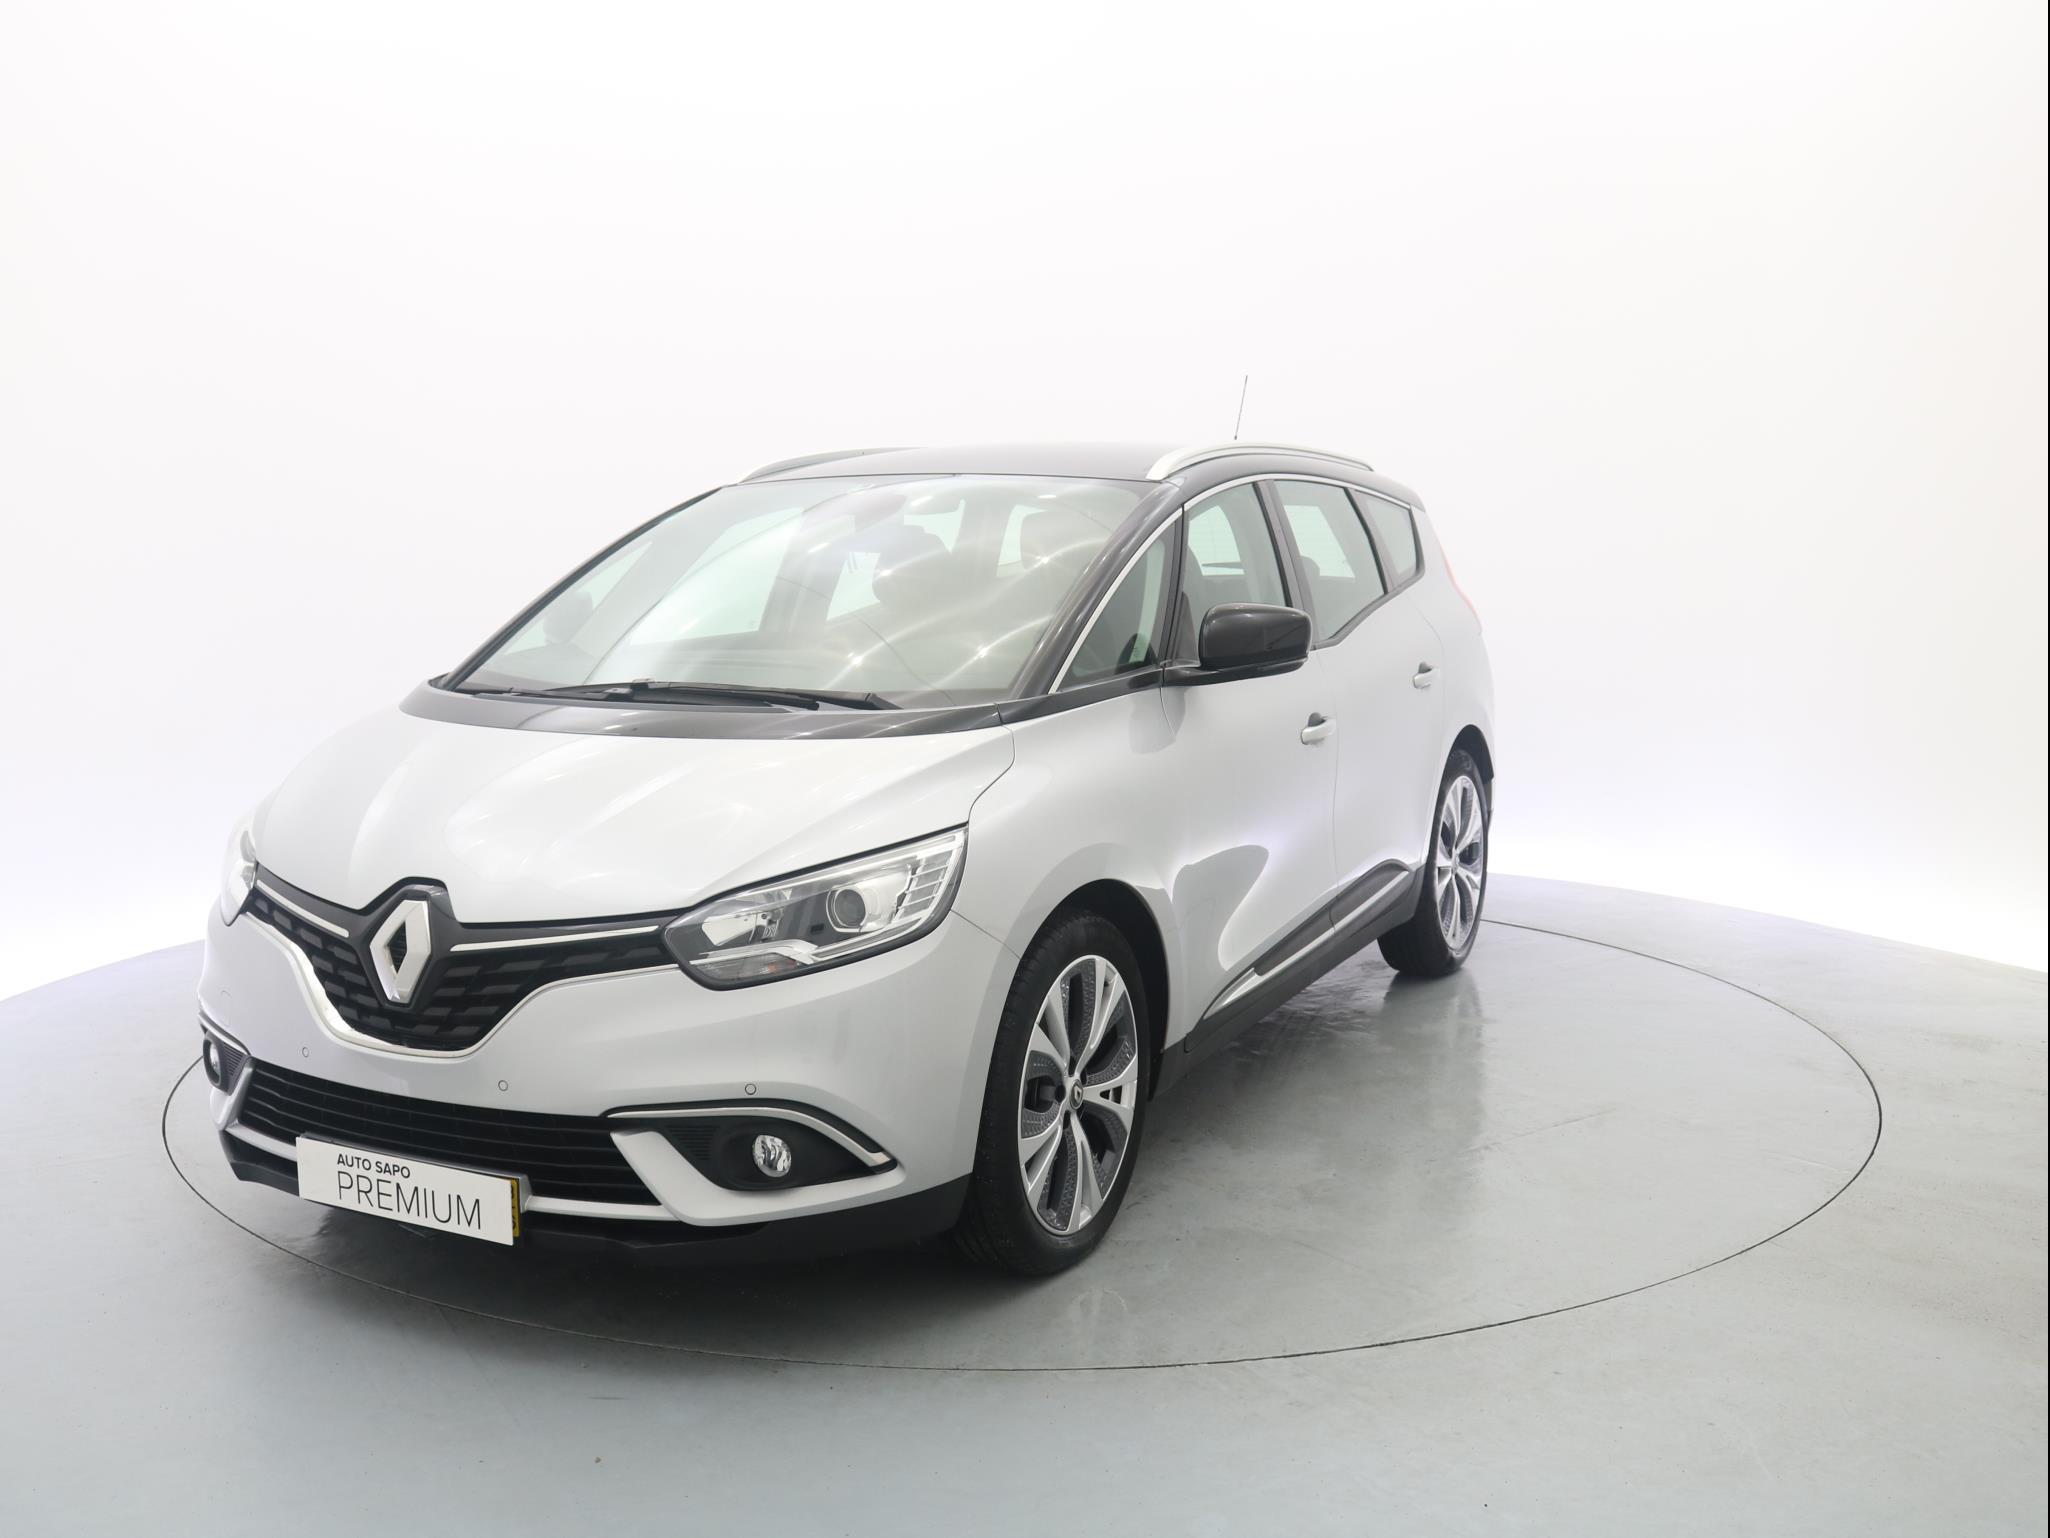 Renault Grand Scénic 1.5 dCi Intens EDC SS (110cv) (5p) (2016 a presente)